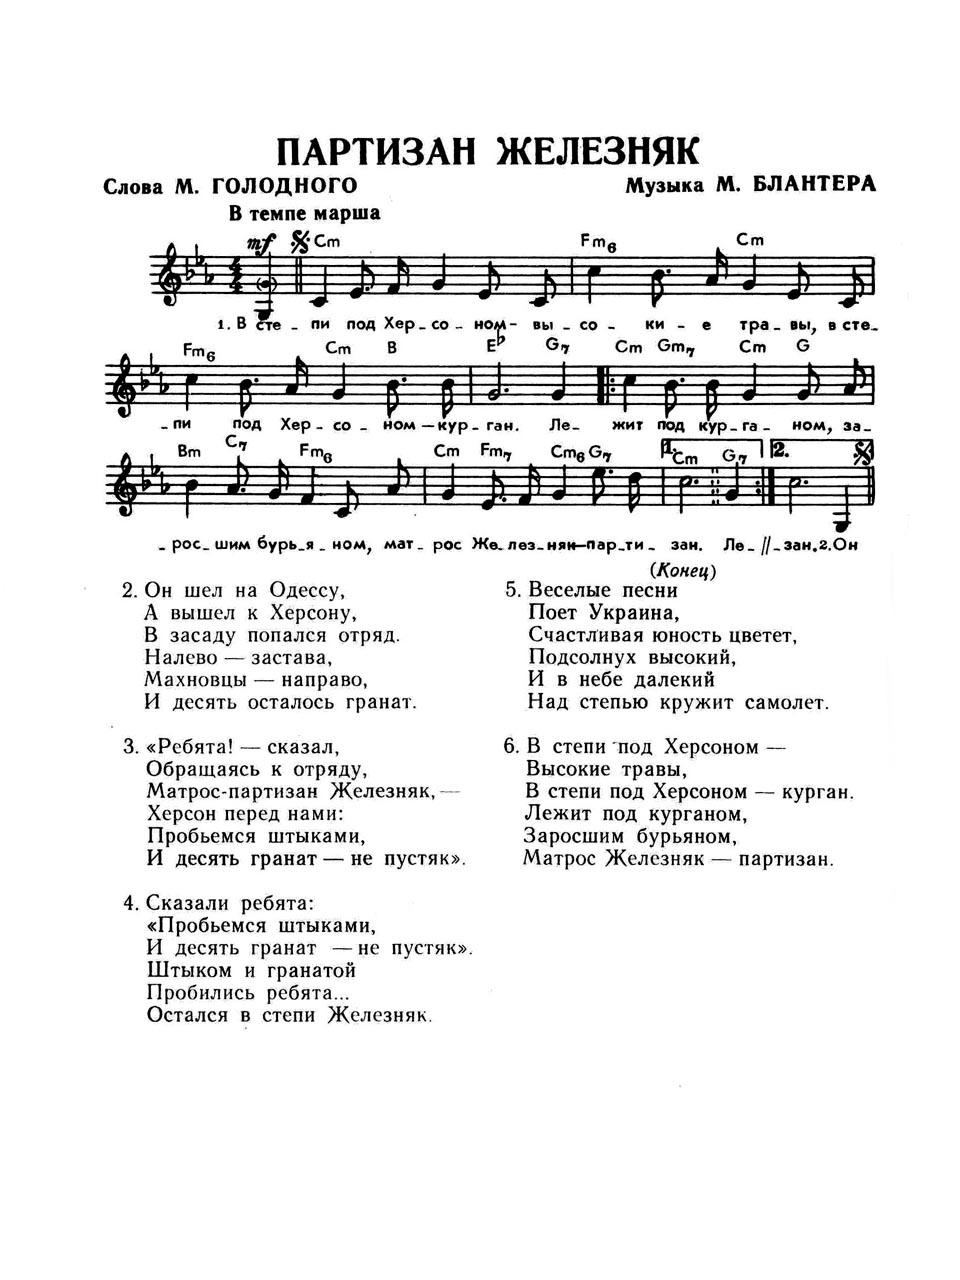 М. Блантер, М. Голодный. Партизан Железняк. Ноты для голоса и аккорды